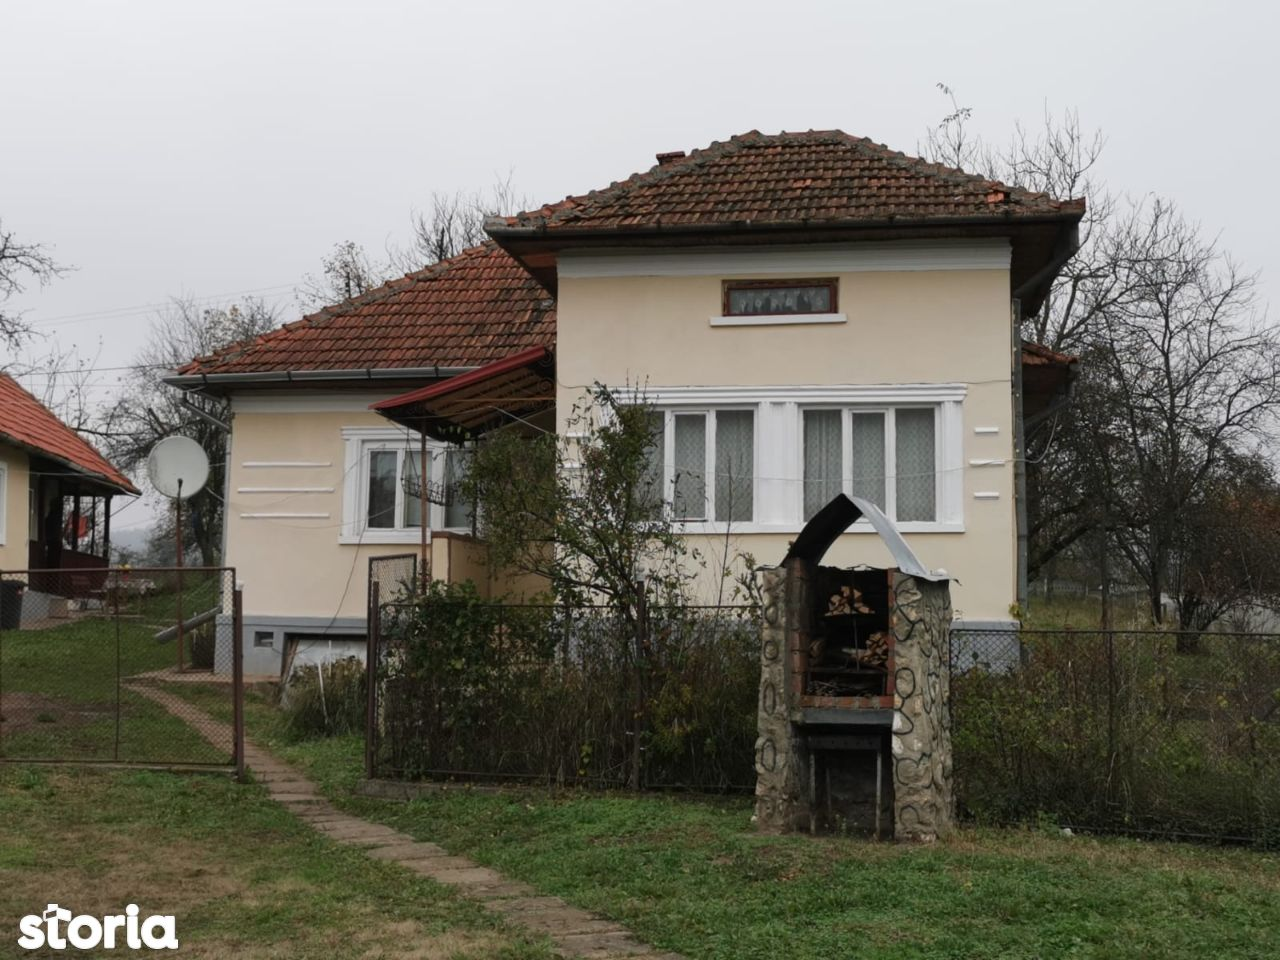 Casa de vanzare in sat Hartagani, comuna Baita+BONUS 70 ARI PADURE